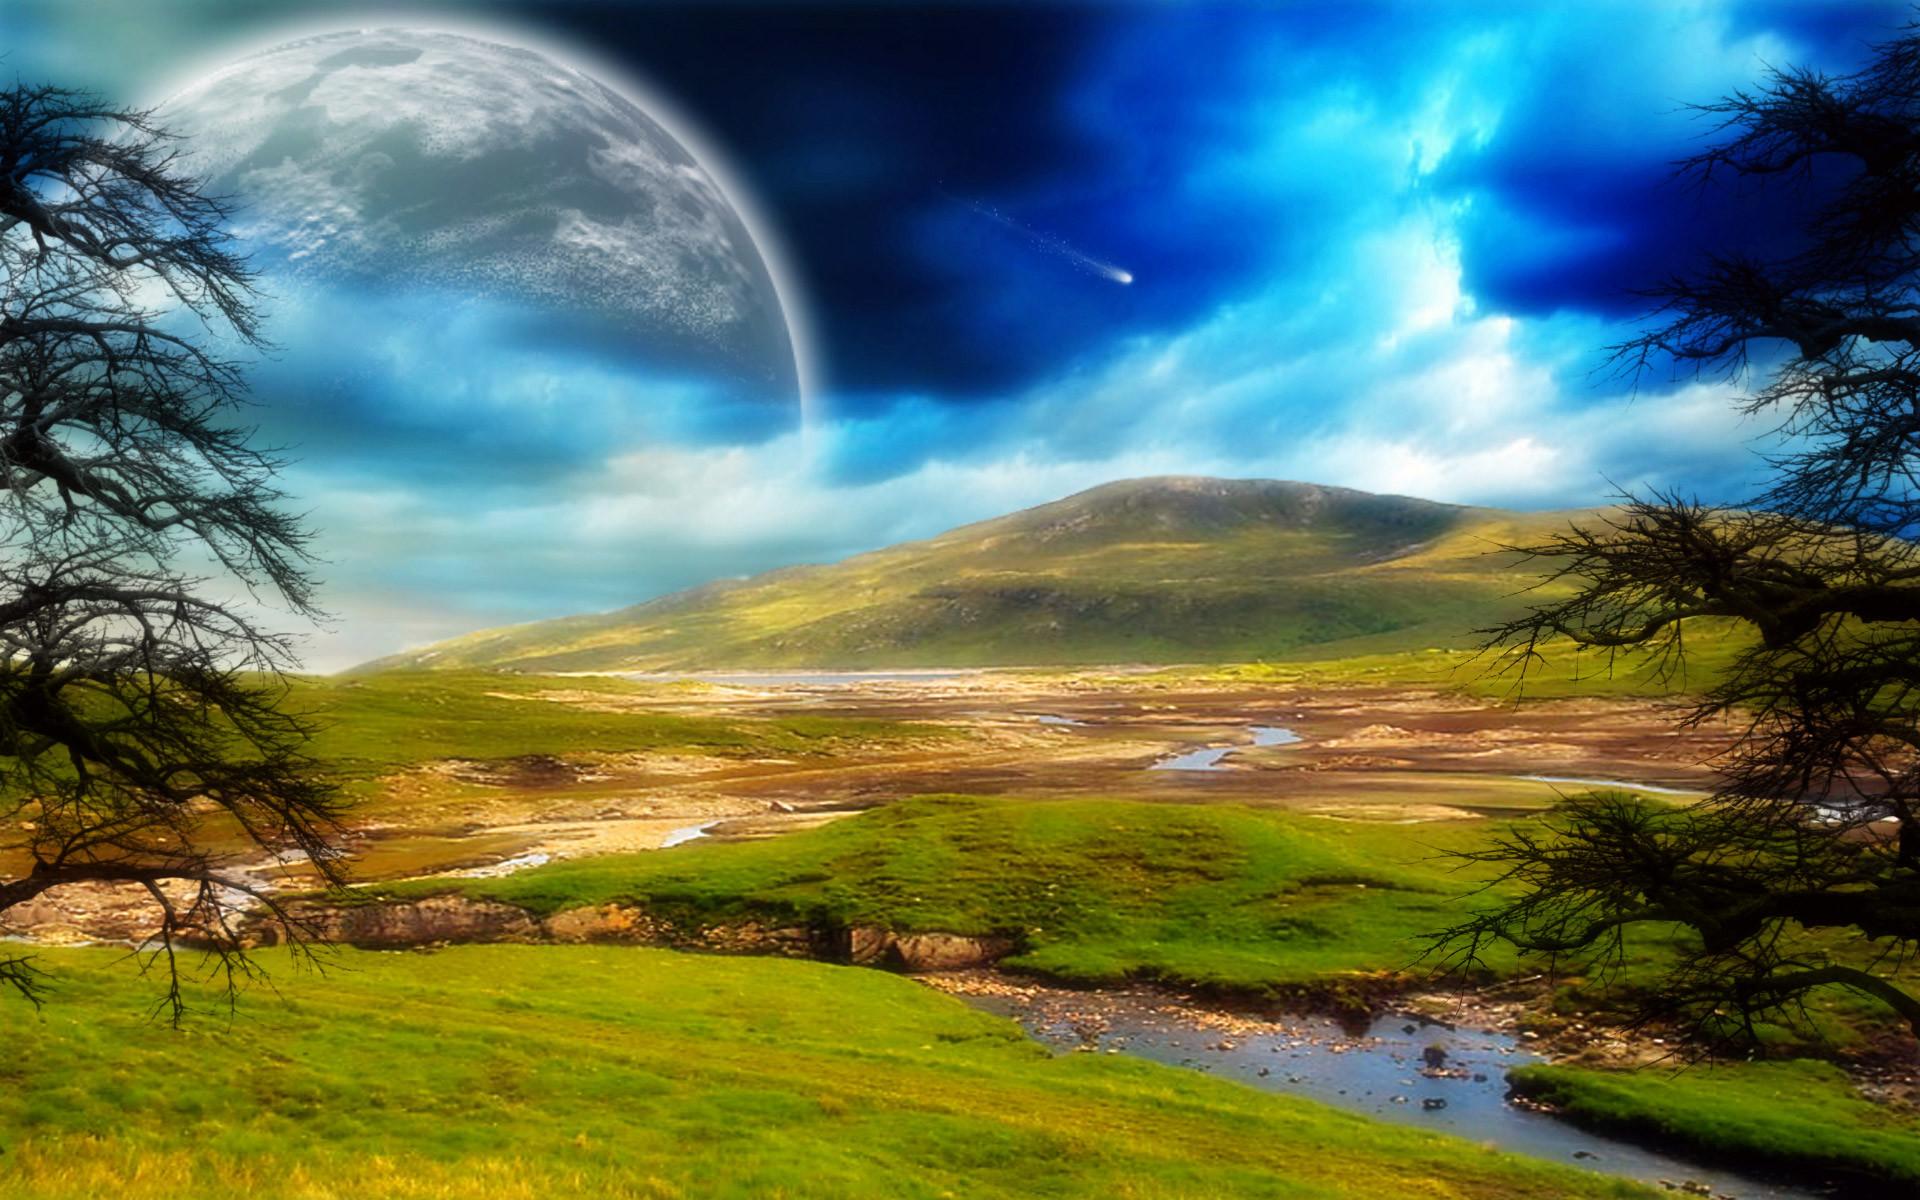 Desktop Nature HD Wallpaper